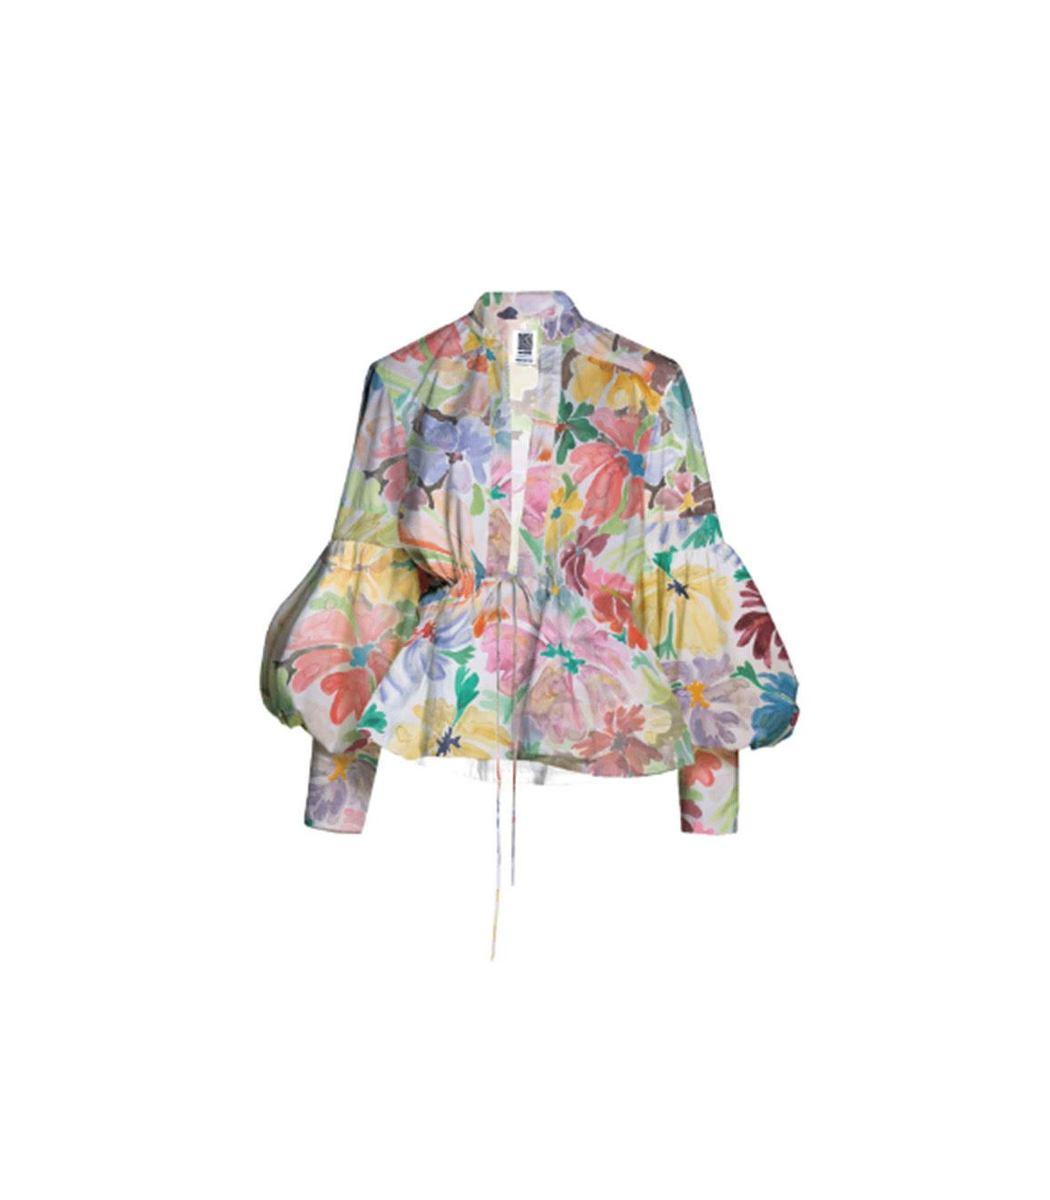 Rosie Assoulin Lantern Puff Sleeve Blouse